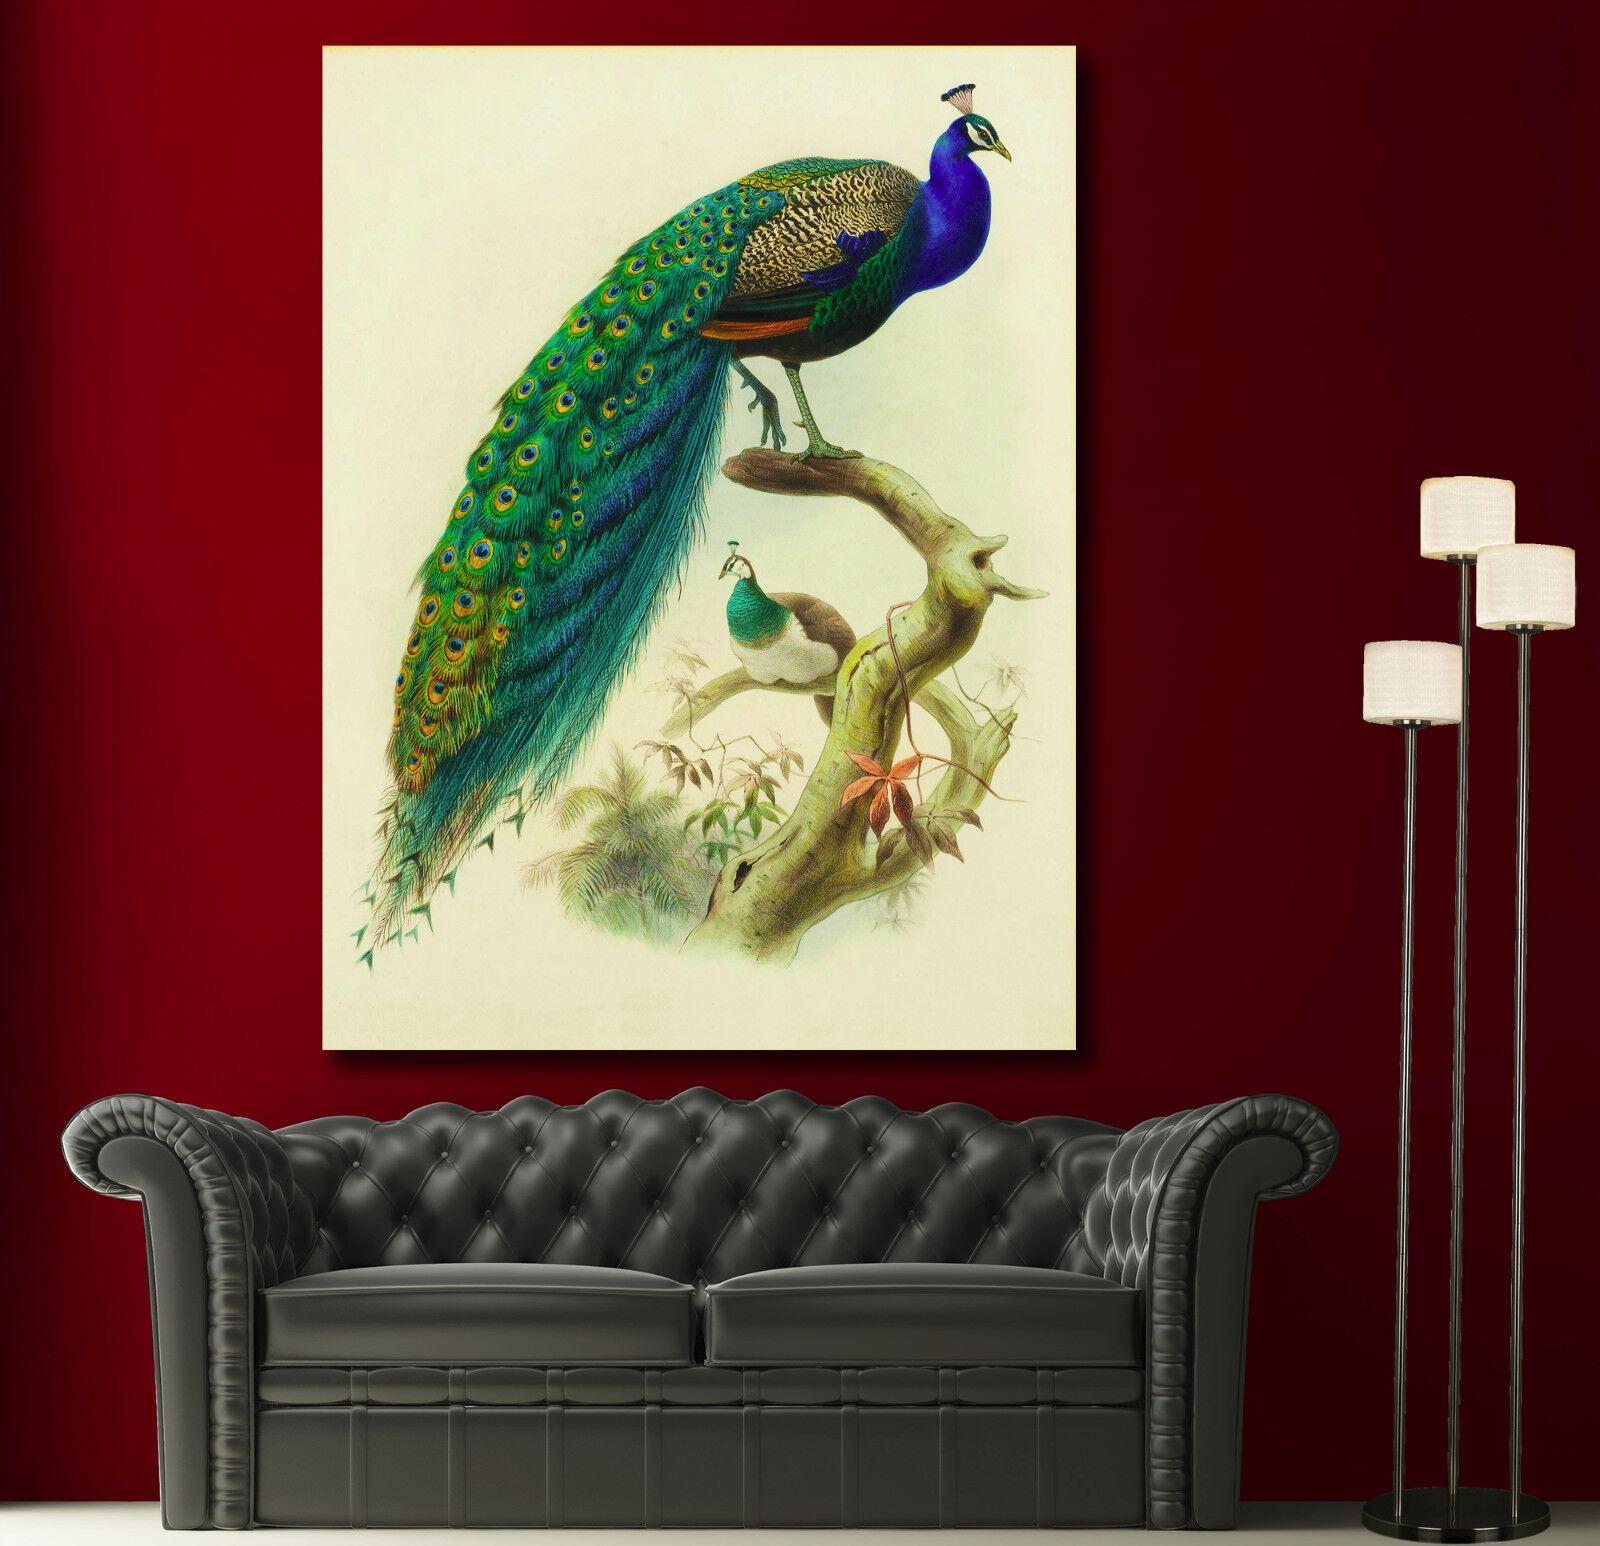 Canvas Giclee Prints Wall Art Peacock Feather Farbeful Print Home Decor 1 2